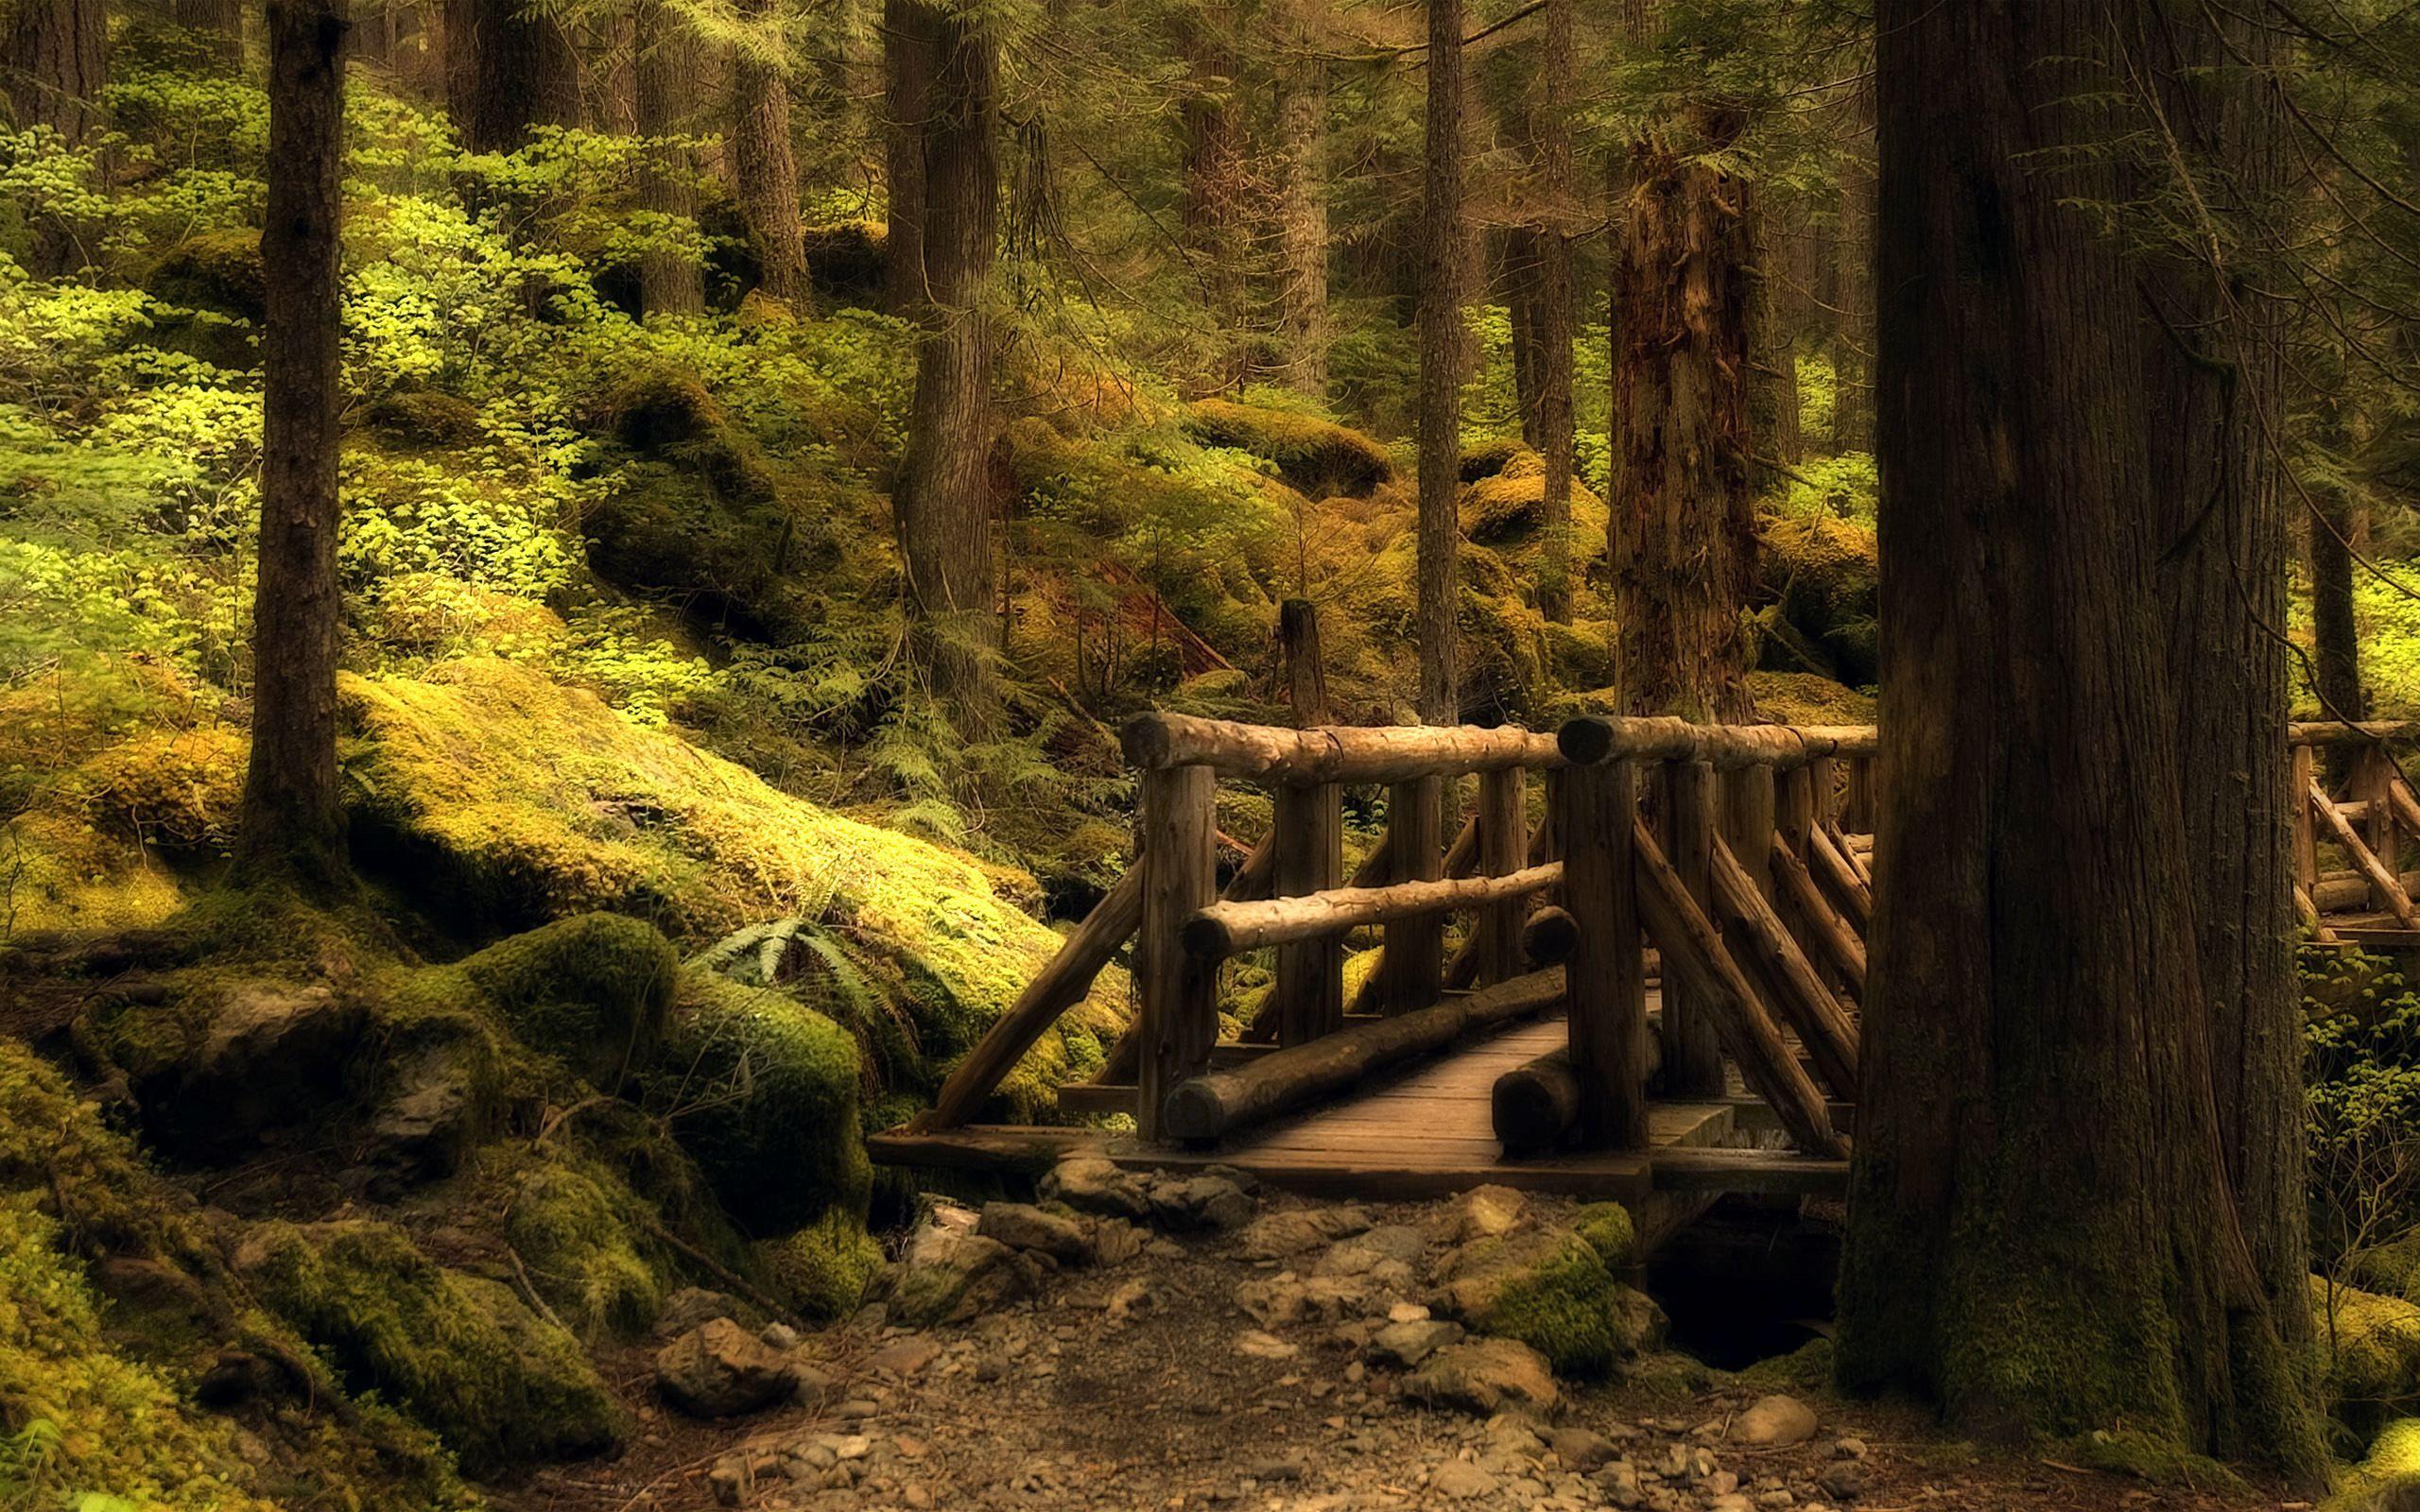 густой лес тропа природа бесплатно